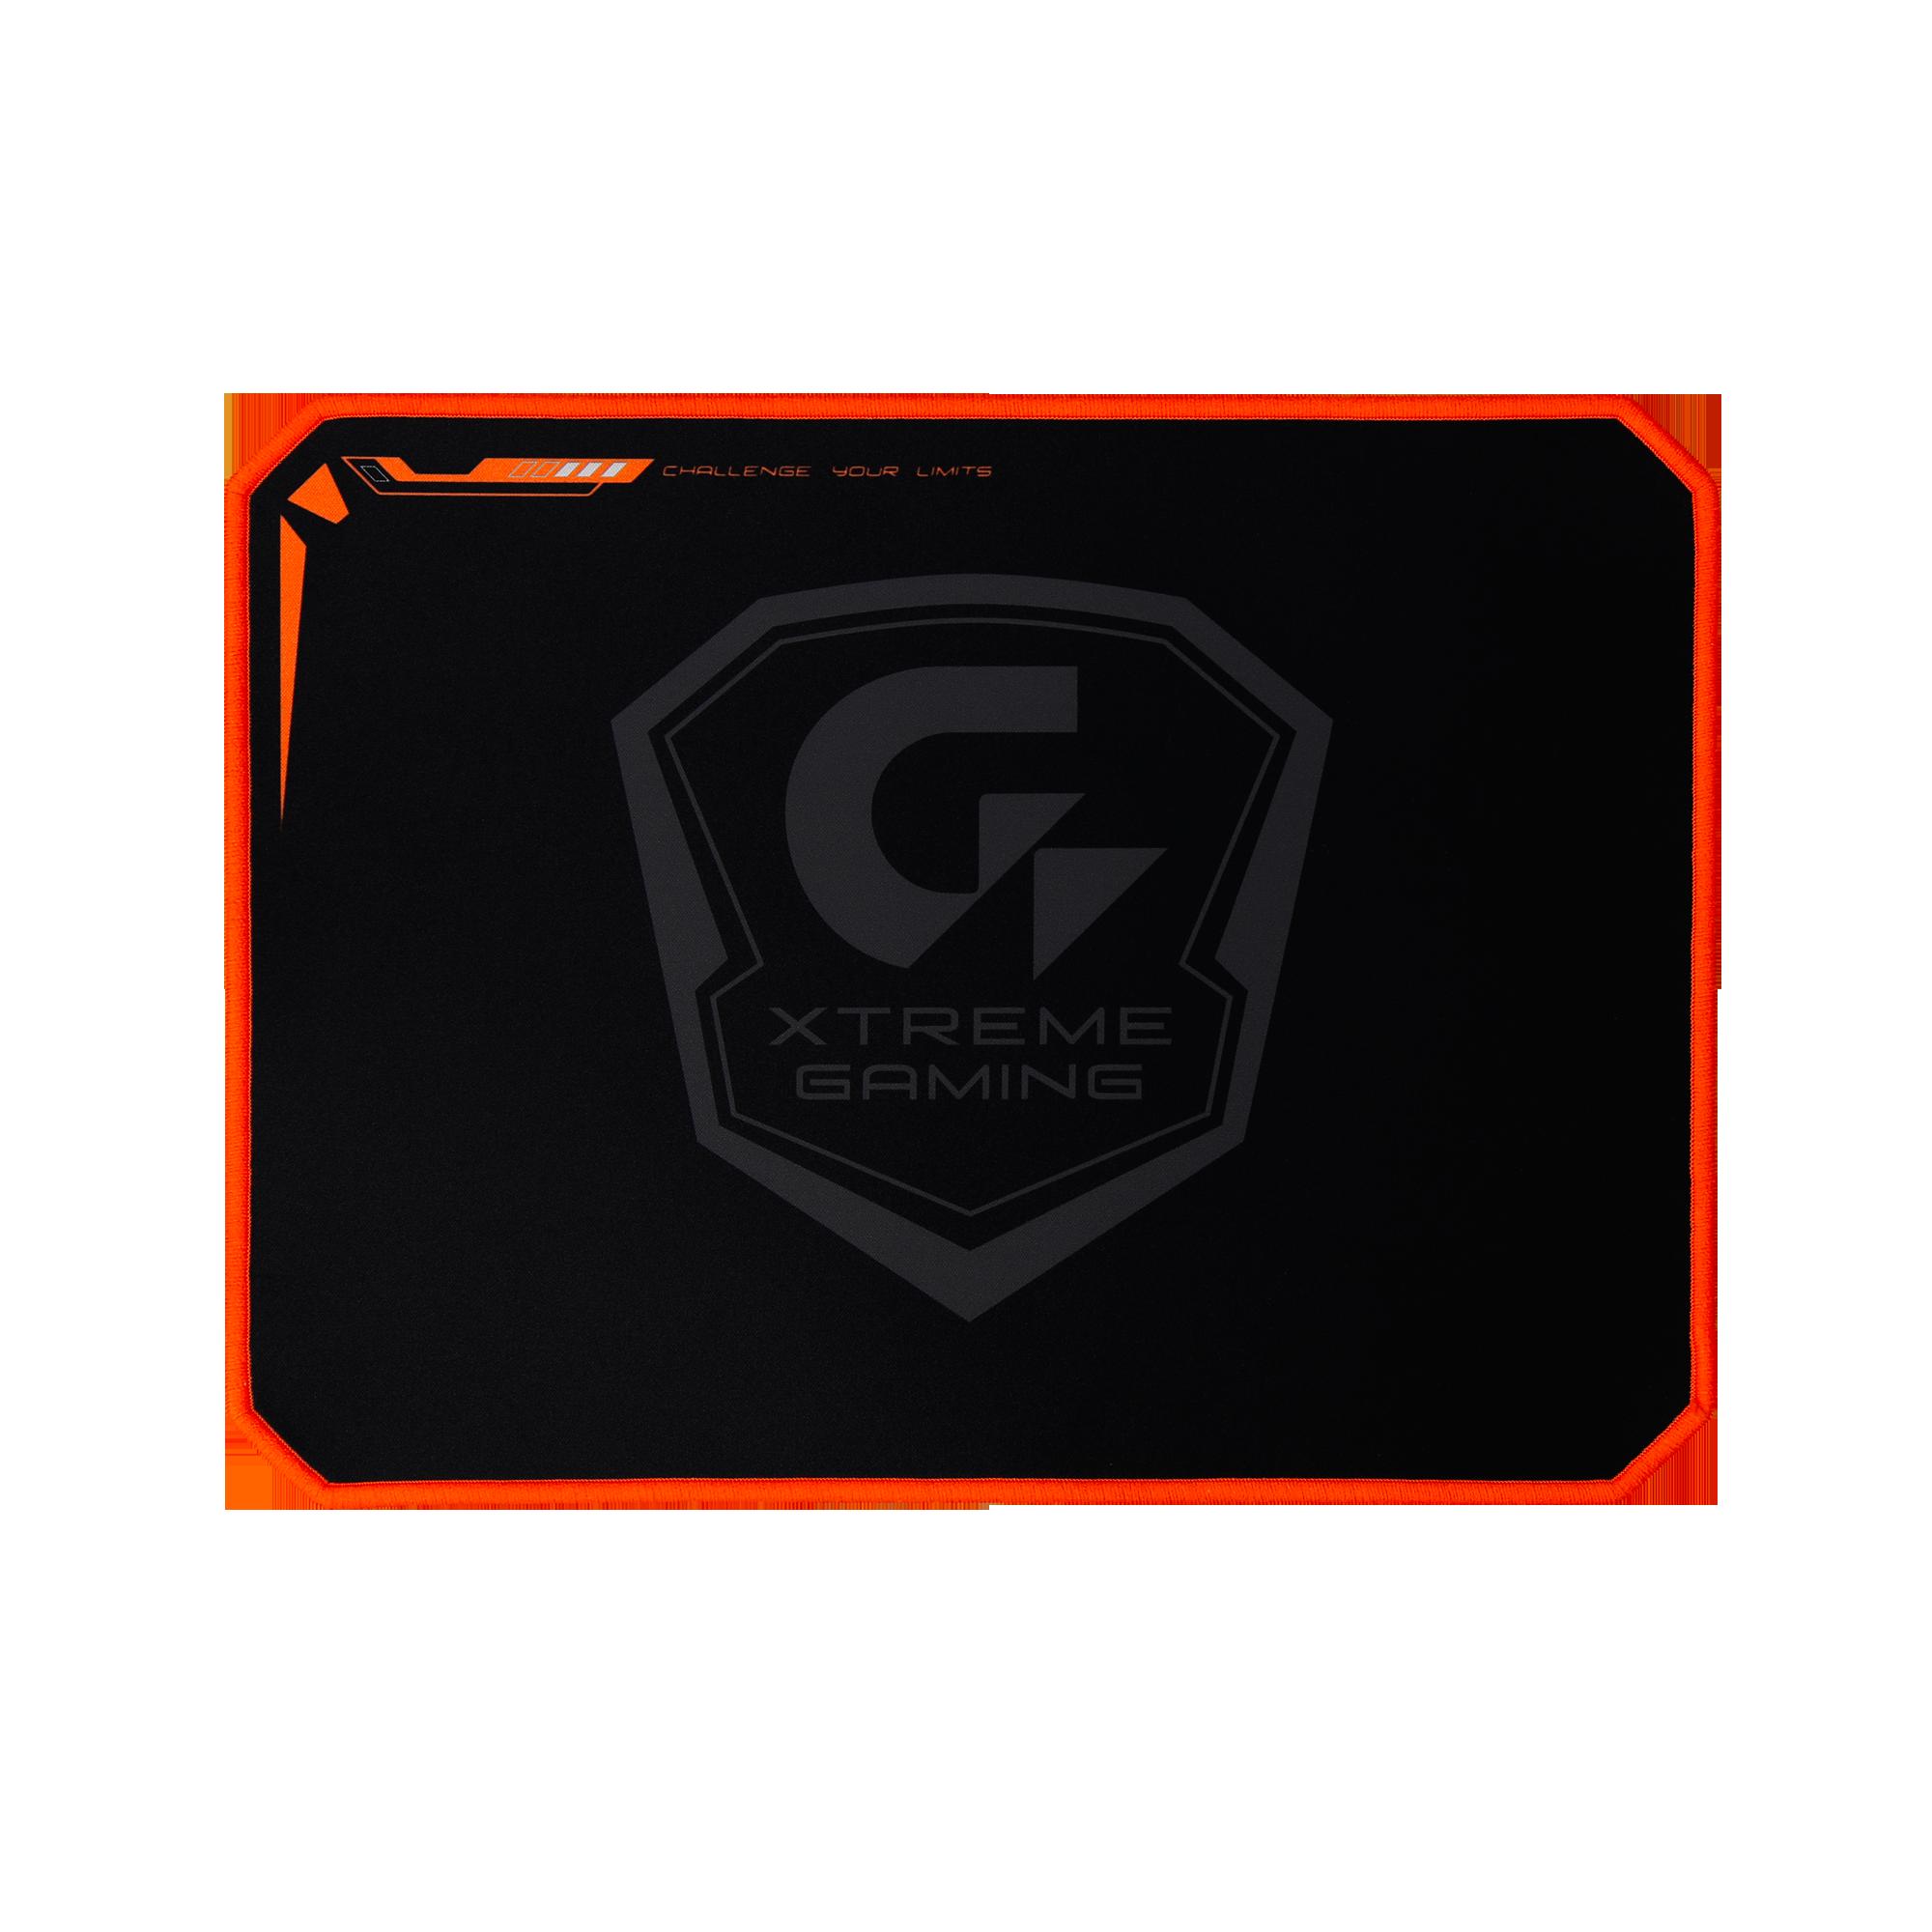 GIGABYTE - Gaming podložka pod myš XMP300